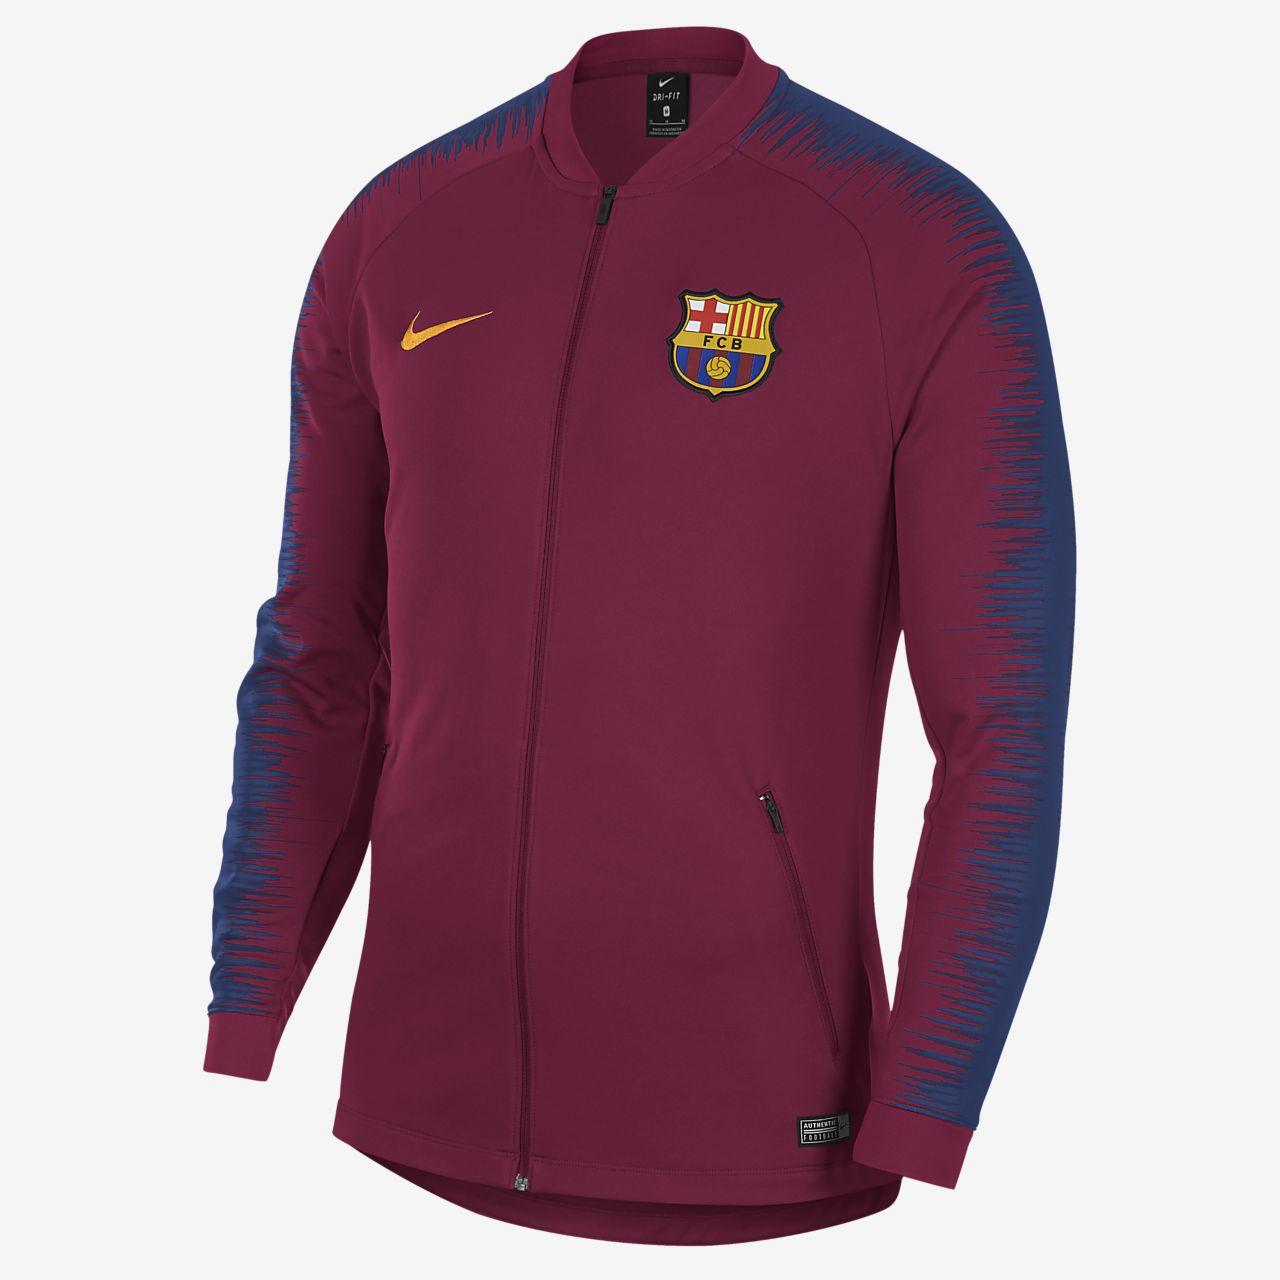 77b4814acbf4f FC Barcelona Anthem Men s Football Jacket. Nike.com CA